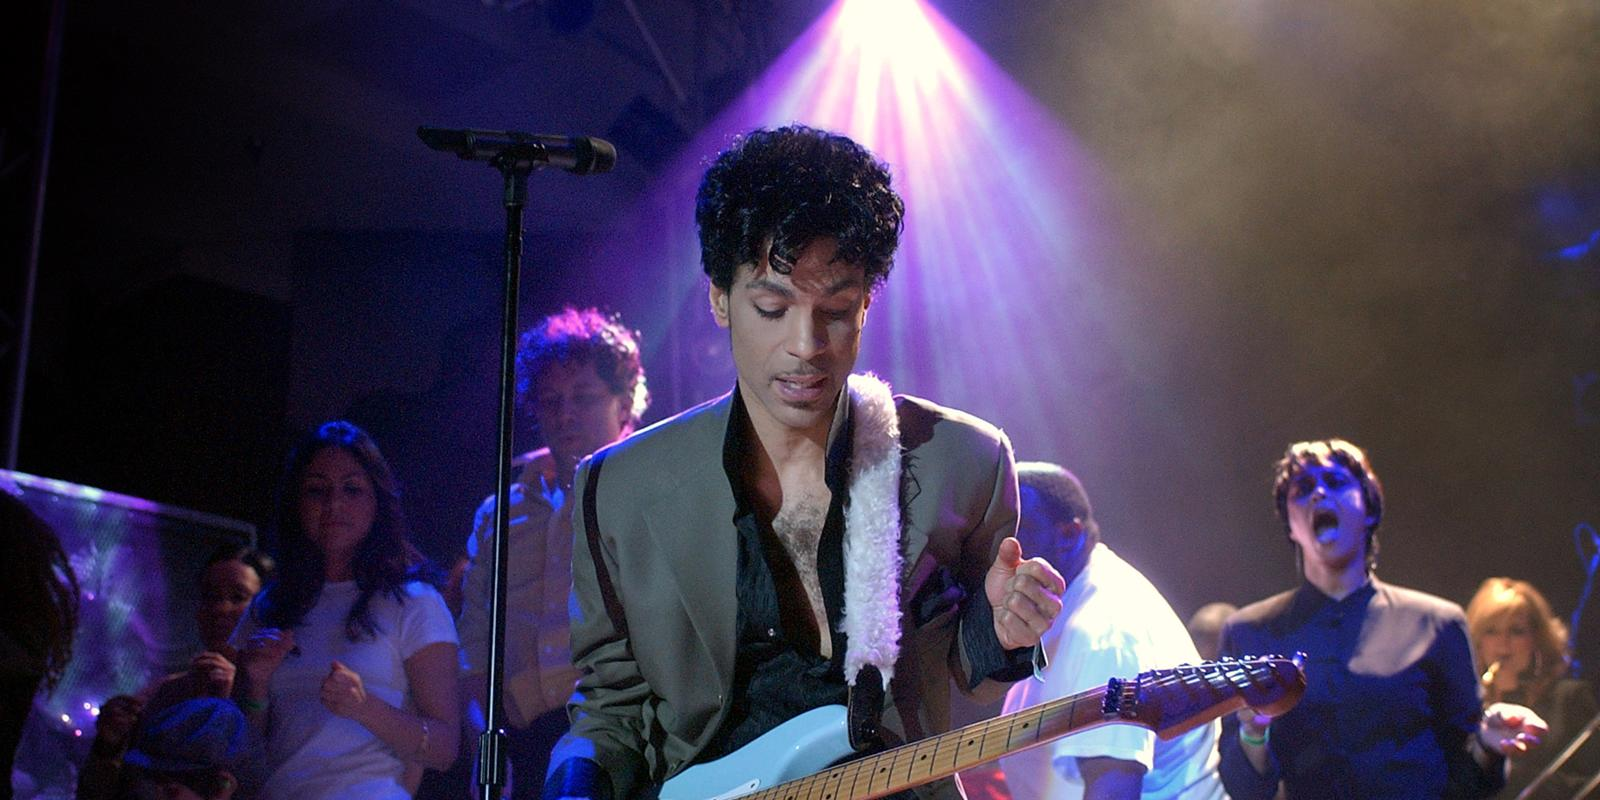 Prince Musicology Tour Youtube